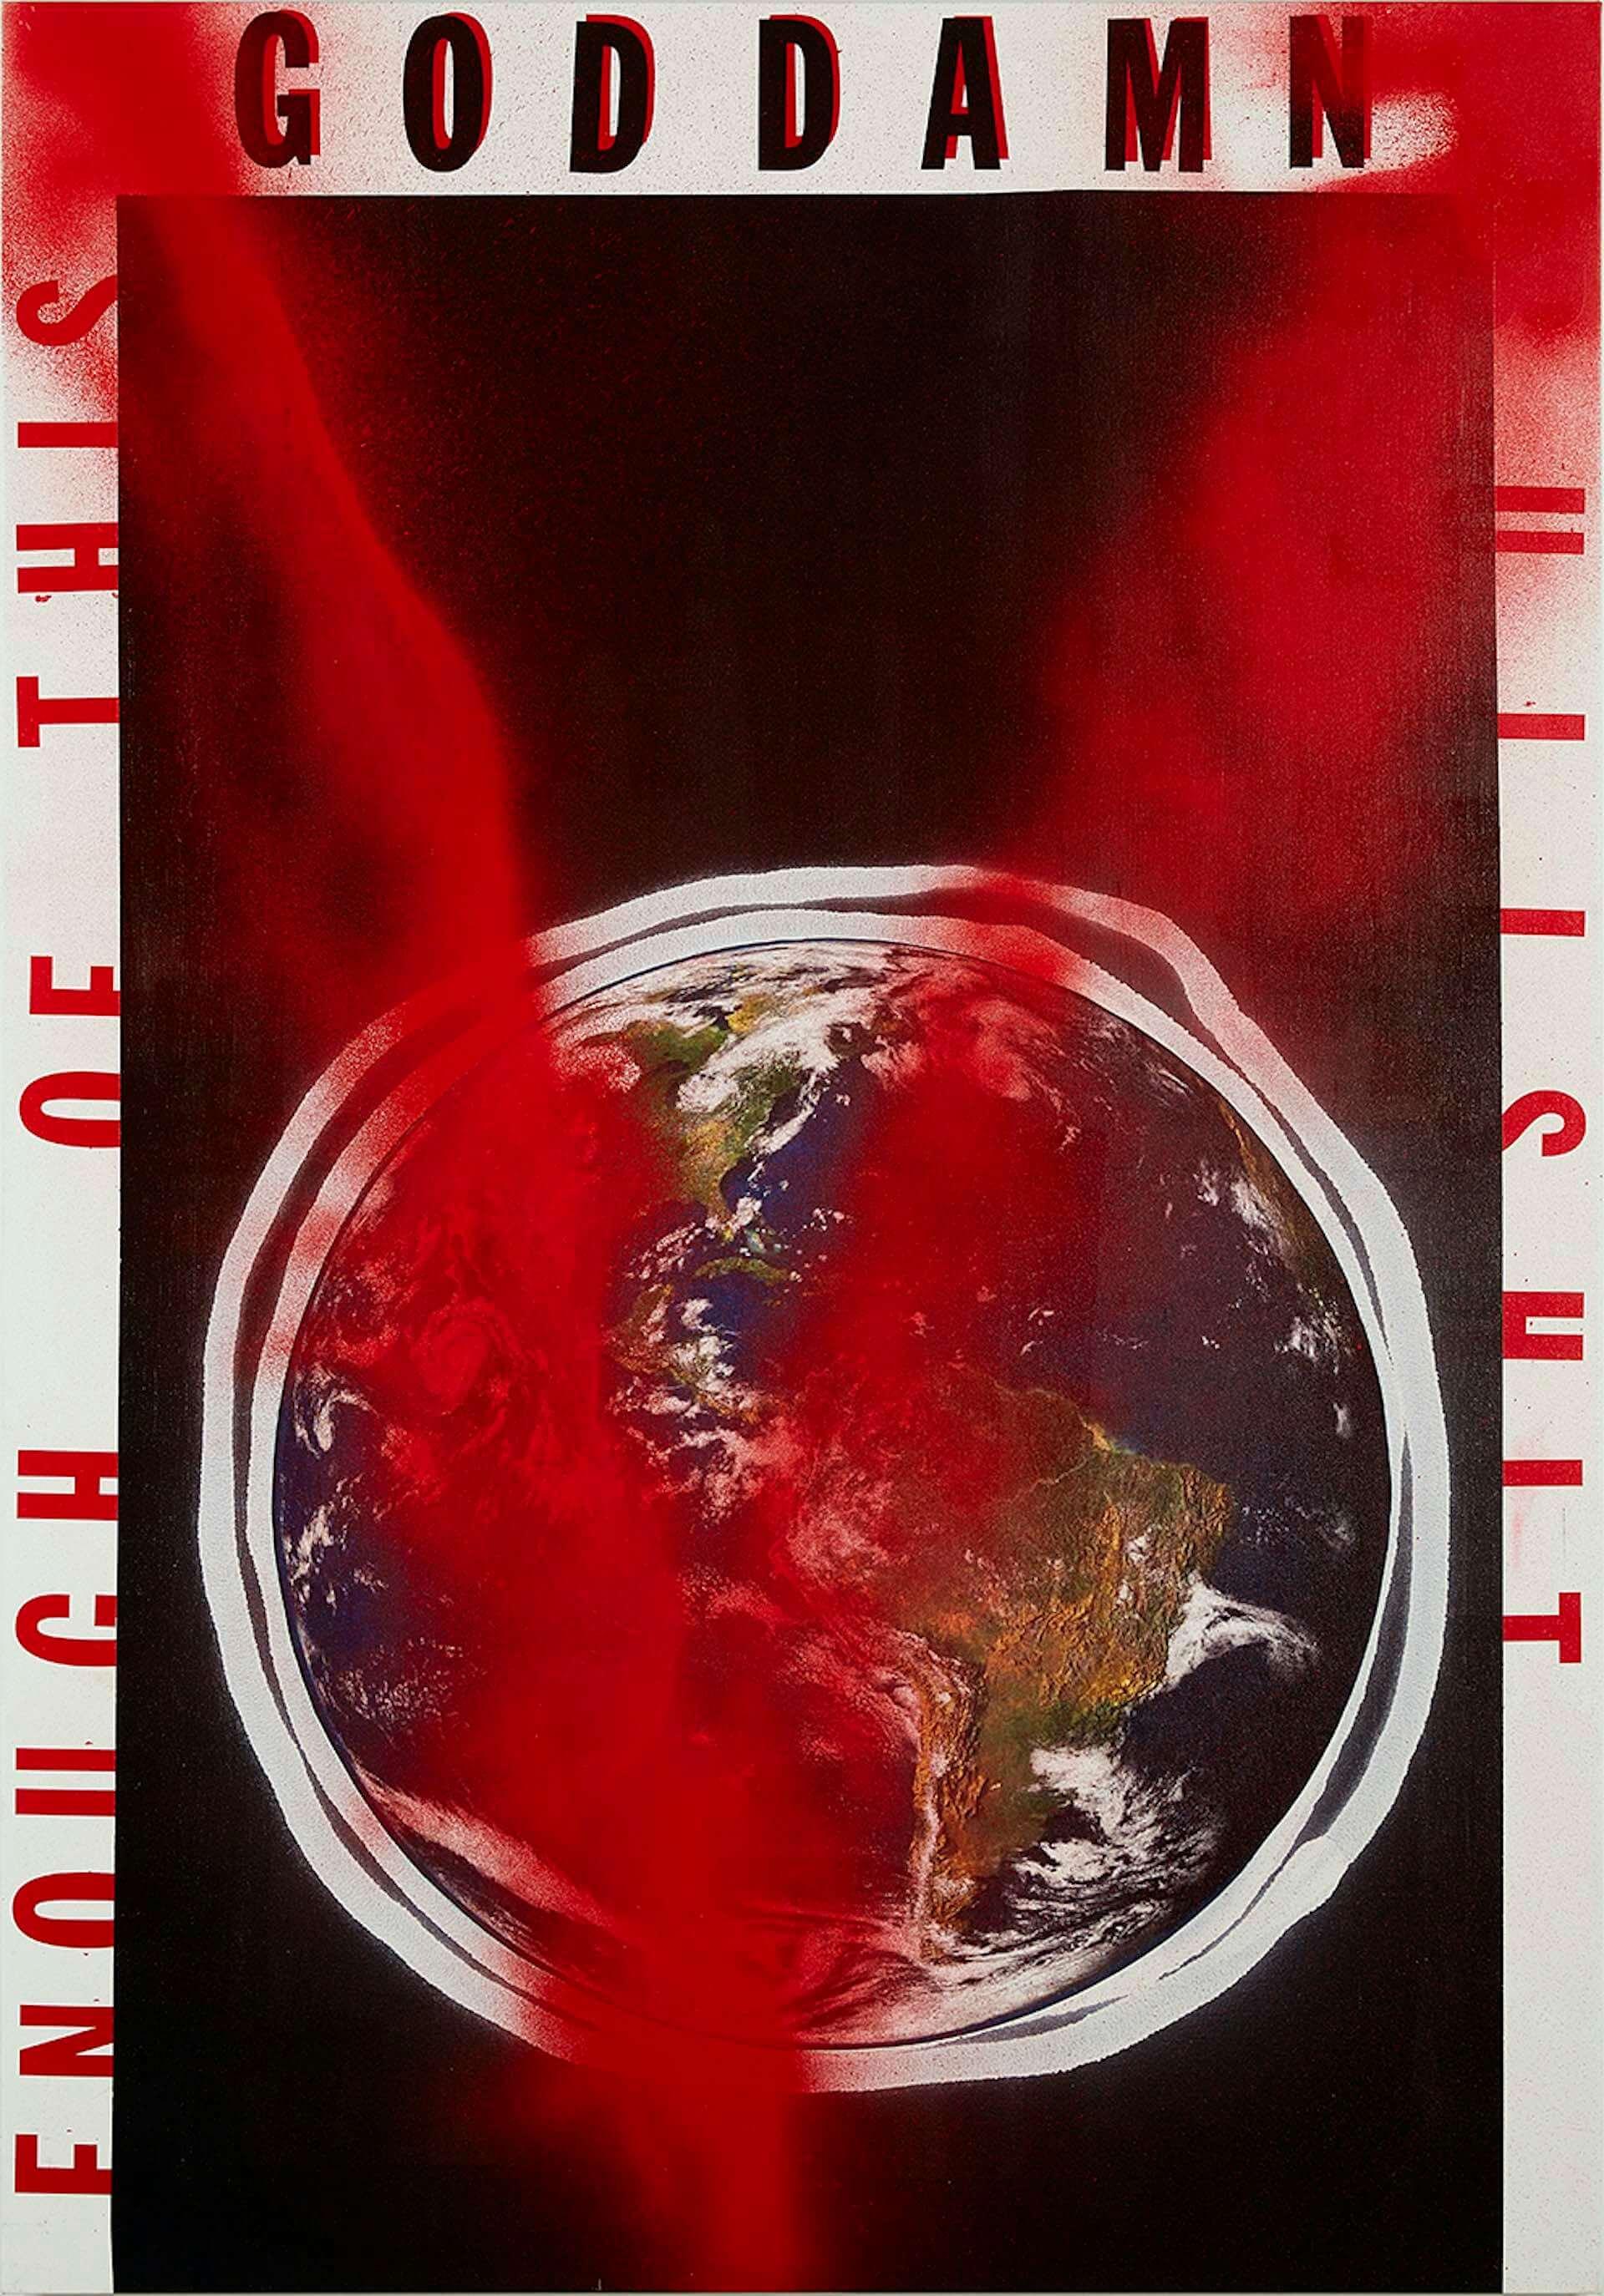 Kanye Westにも作品提供するCali Thornhill DeWittの展覧会<TOKYO OLYMPICS>がGALLERY COMMONにて明日開幕! art2000820_cali-thornhill-deWitt_3-1920x2749